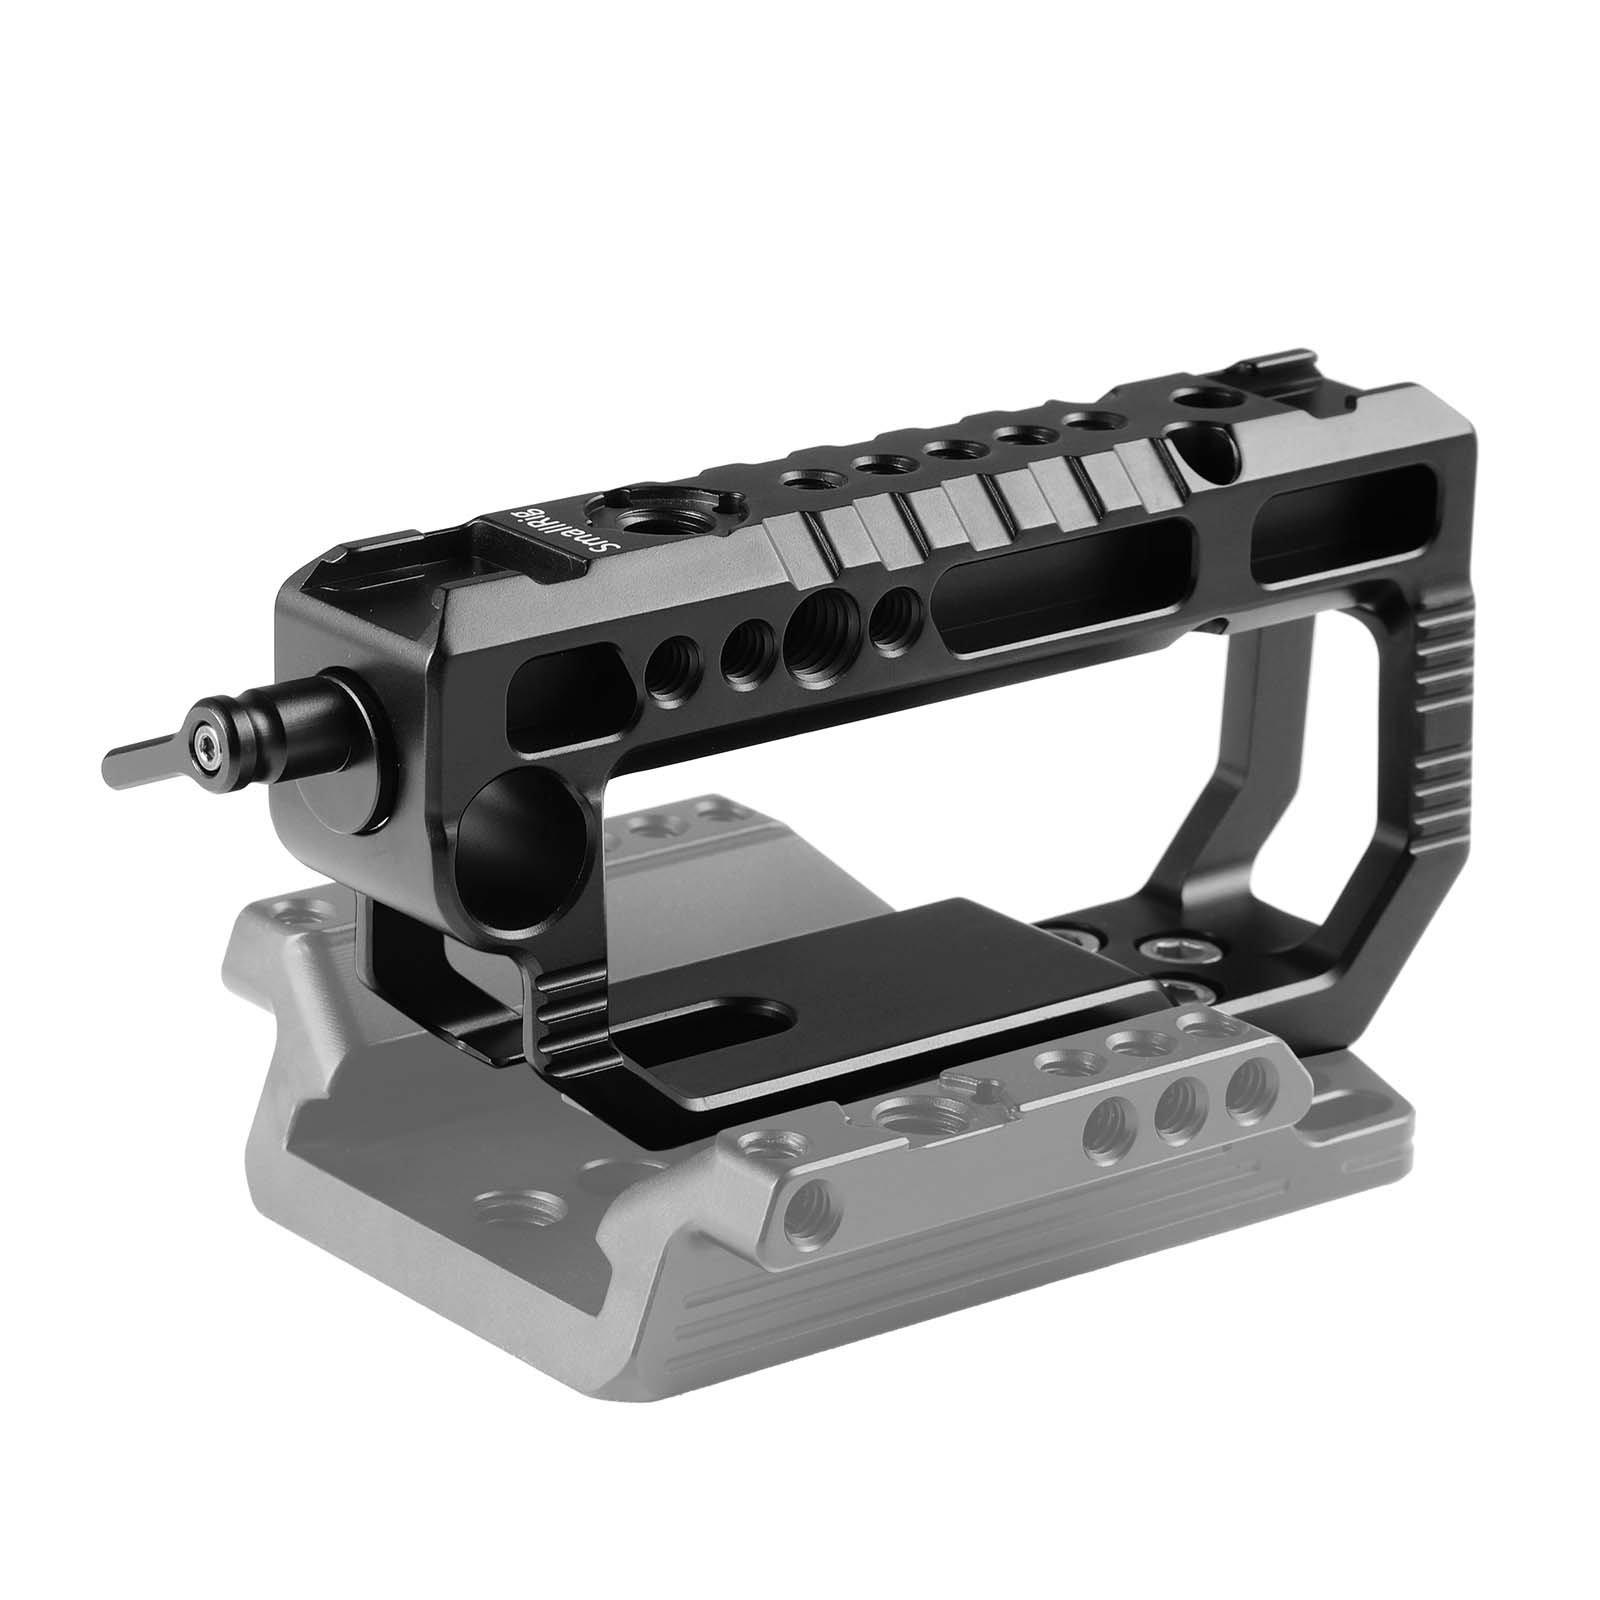 SmallRig Top Handle for Blackmagic URSA Mini/Mini Pro with Rod Clamp and Cold Shoe - 2000